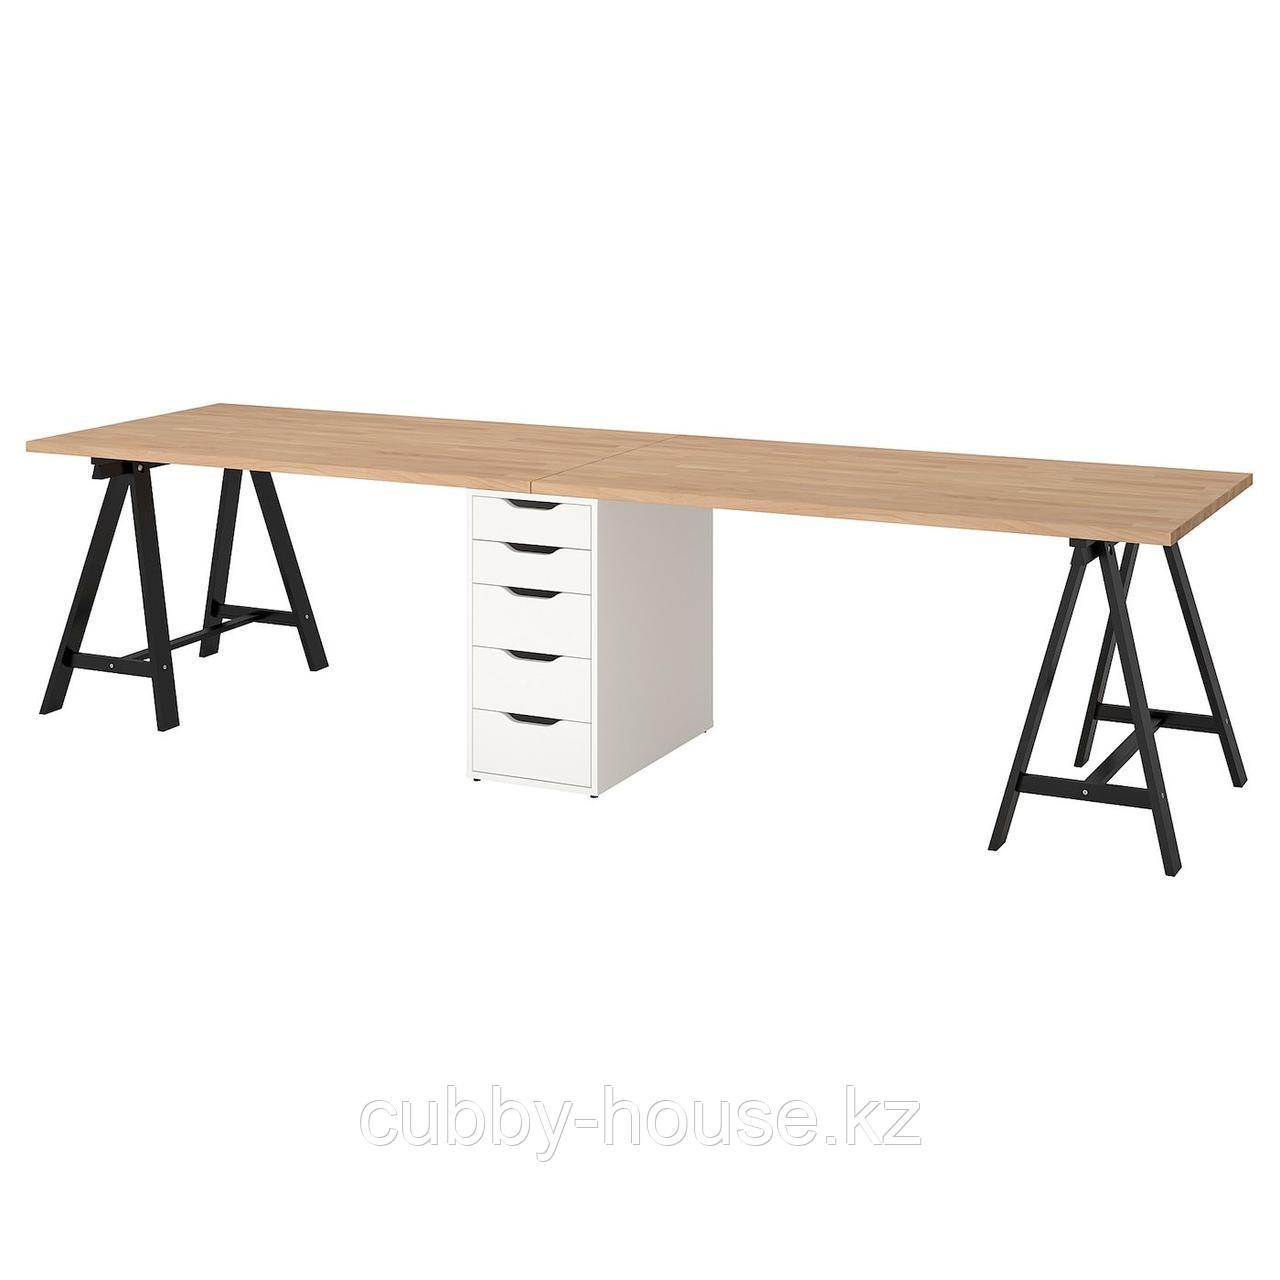 ГЕРТОН Стол, бук, черный белый, 310x75 см